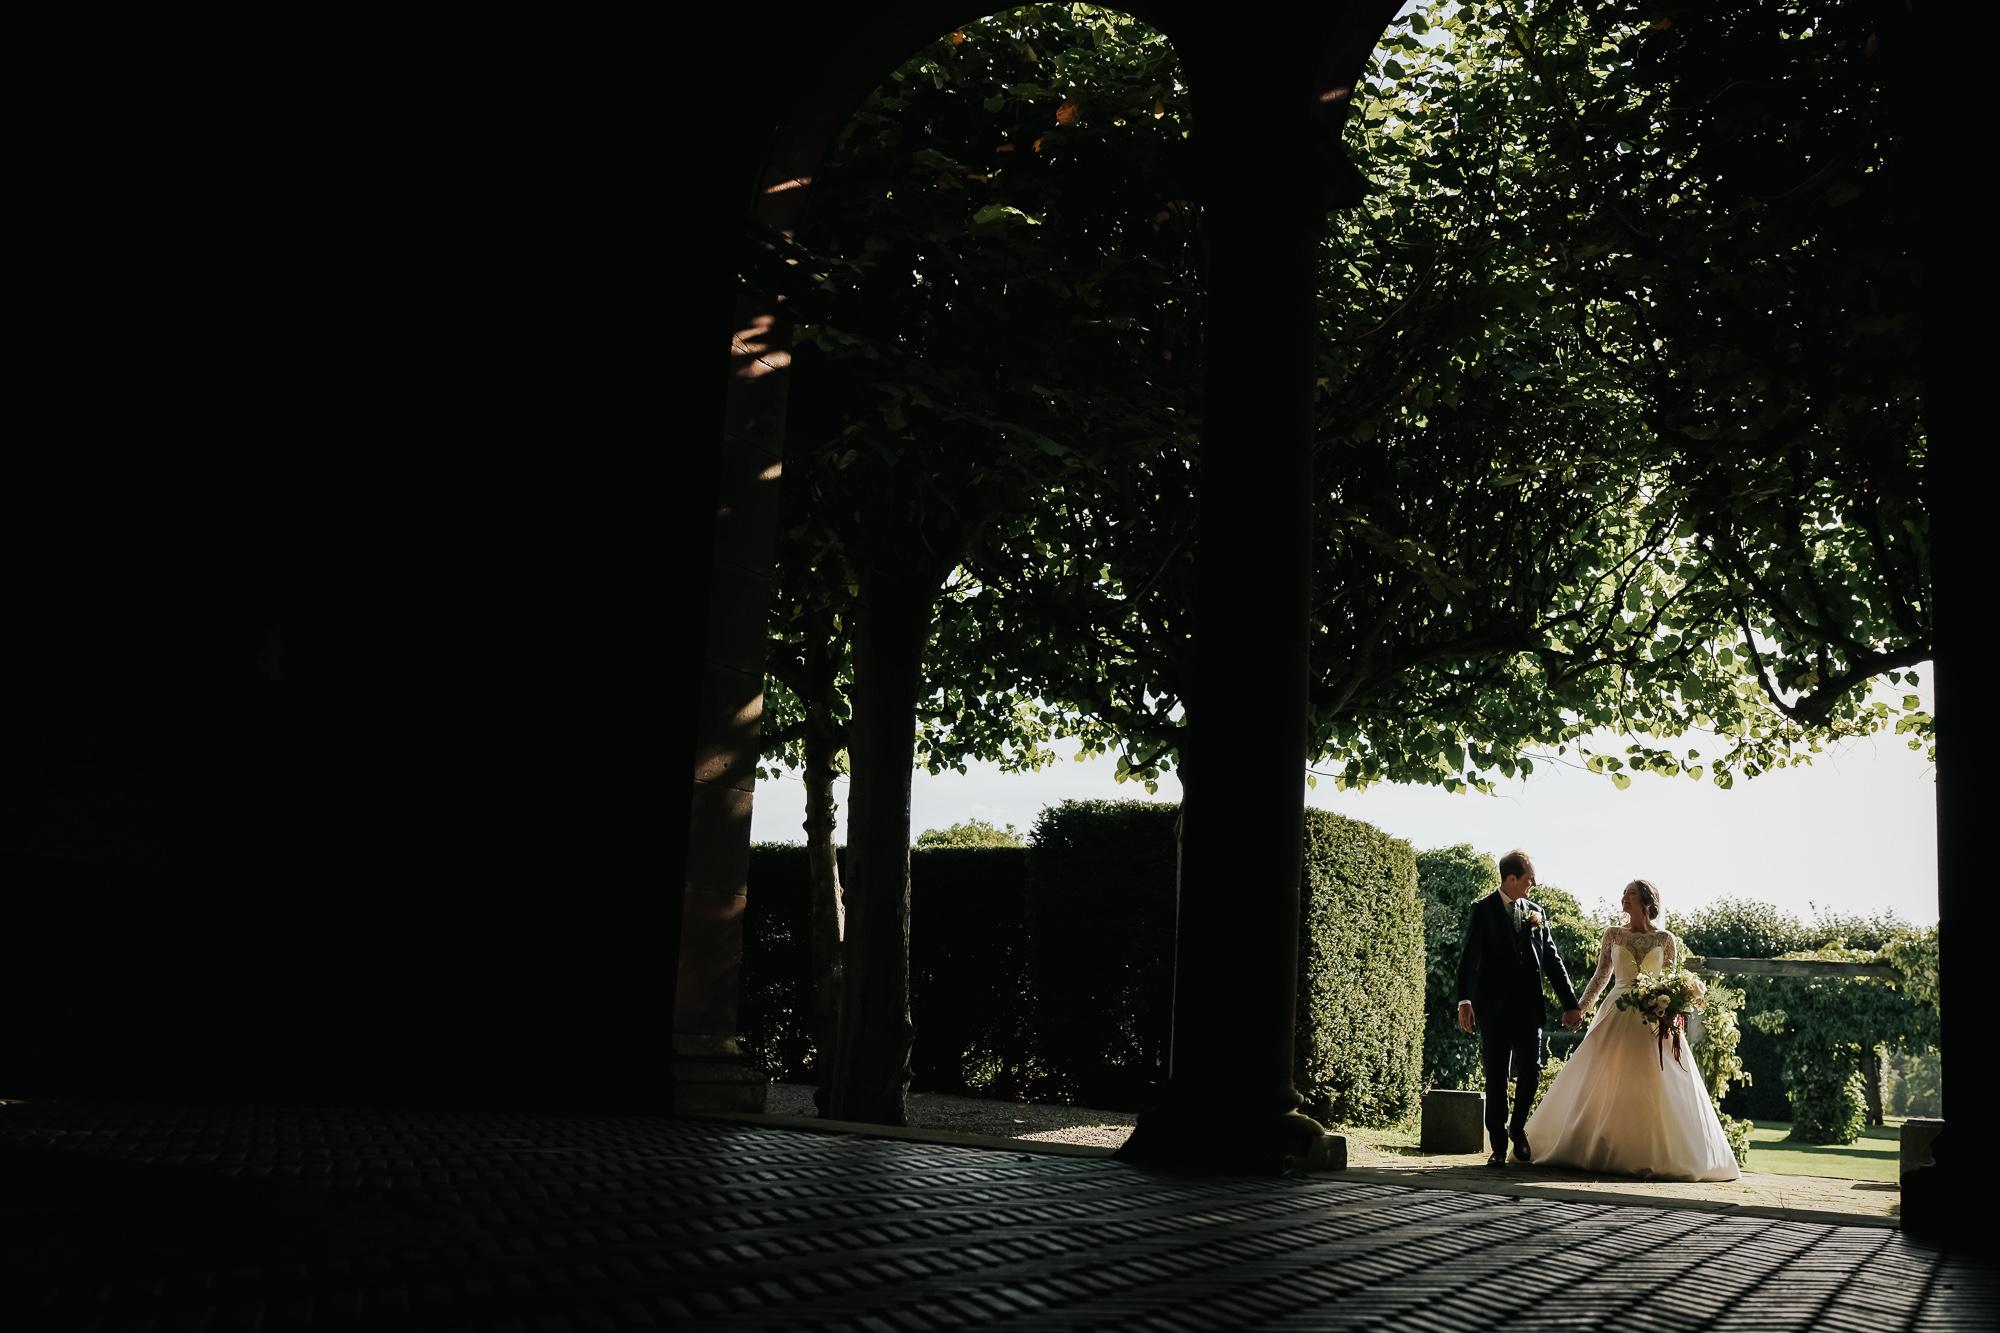 Thornton Manor Cheshire wedding photographer Wedding Photography Cheshire wedding photographer (45 of 64).jpg